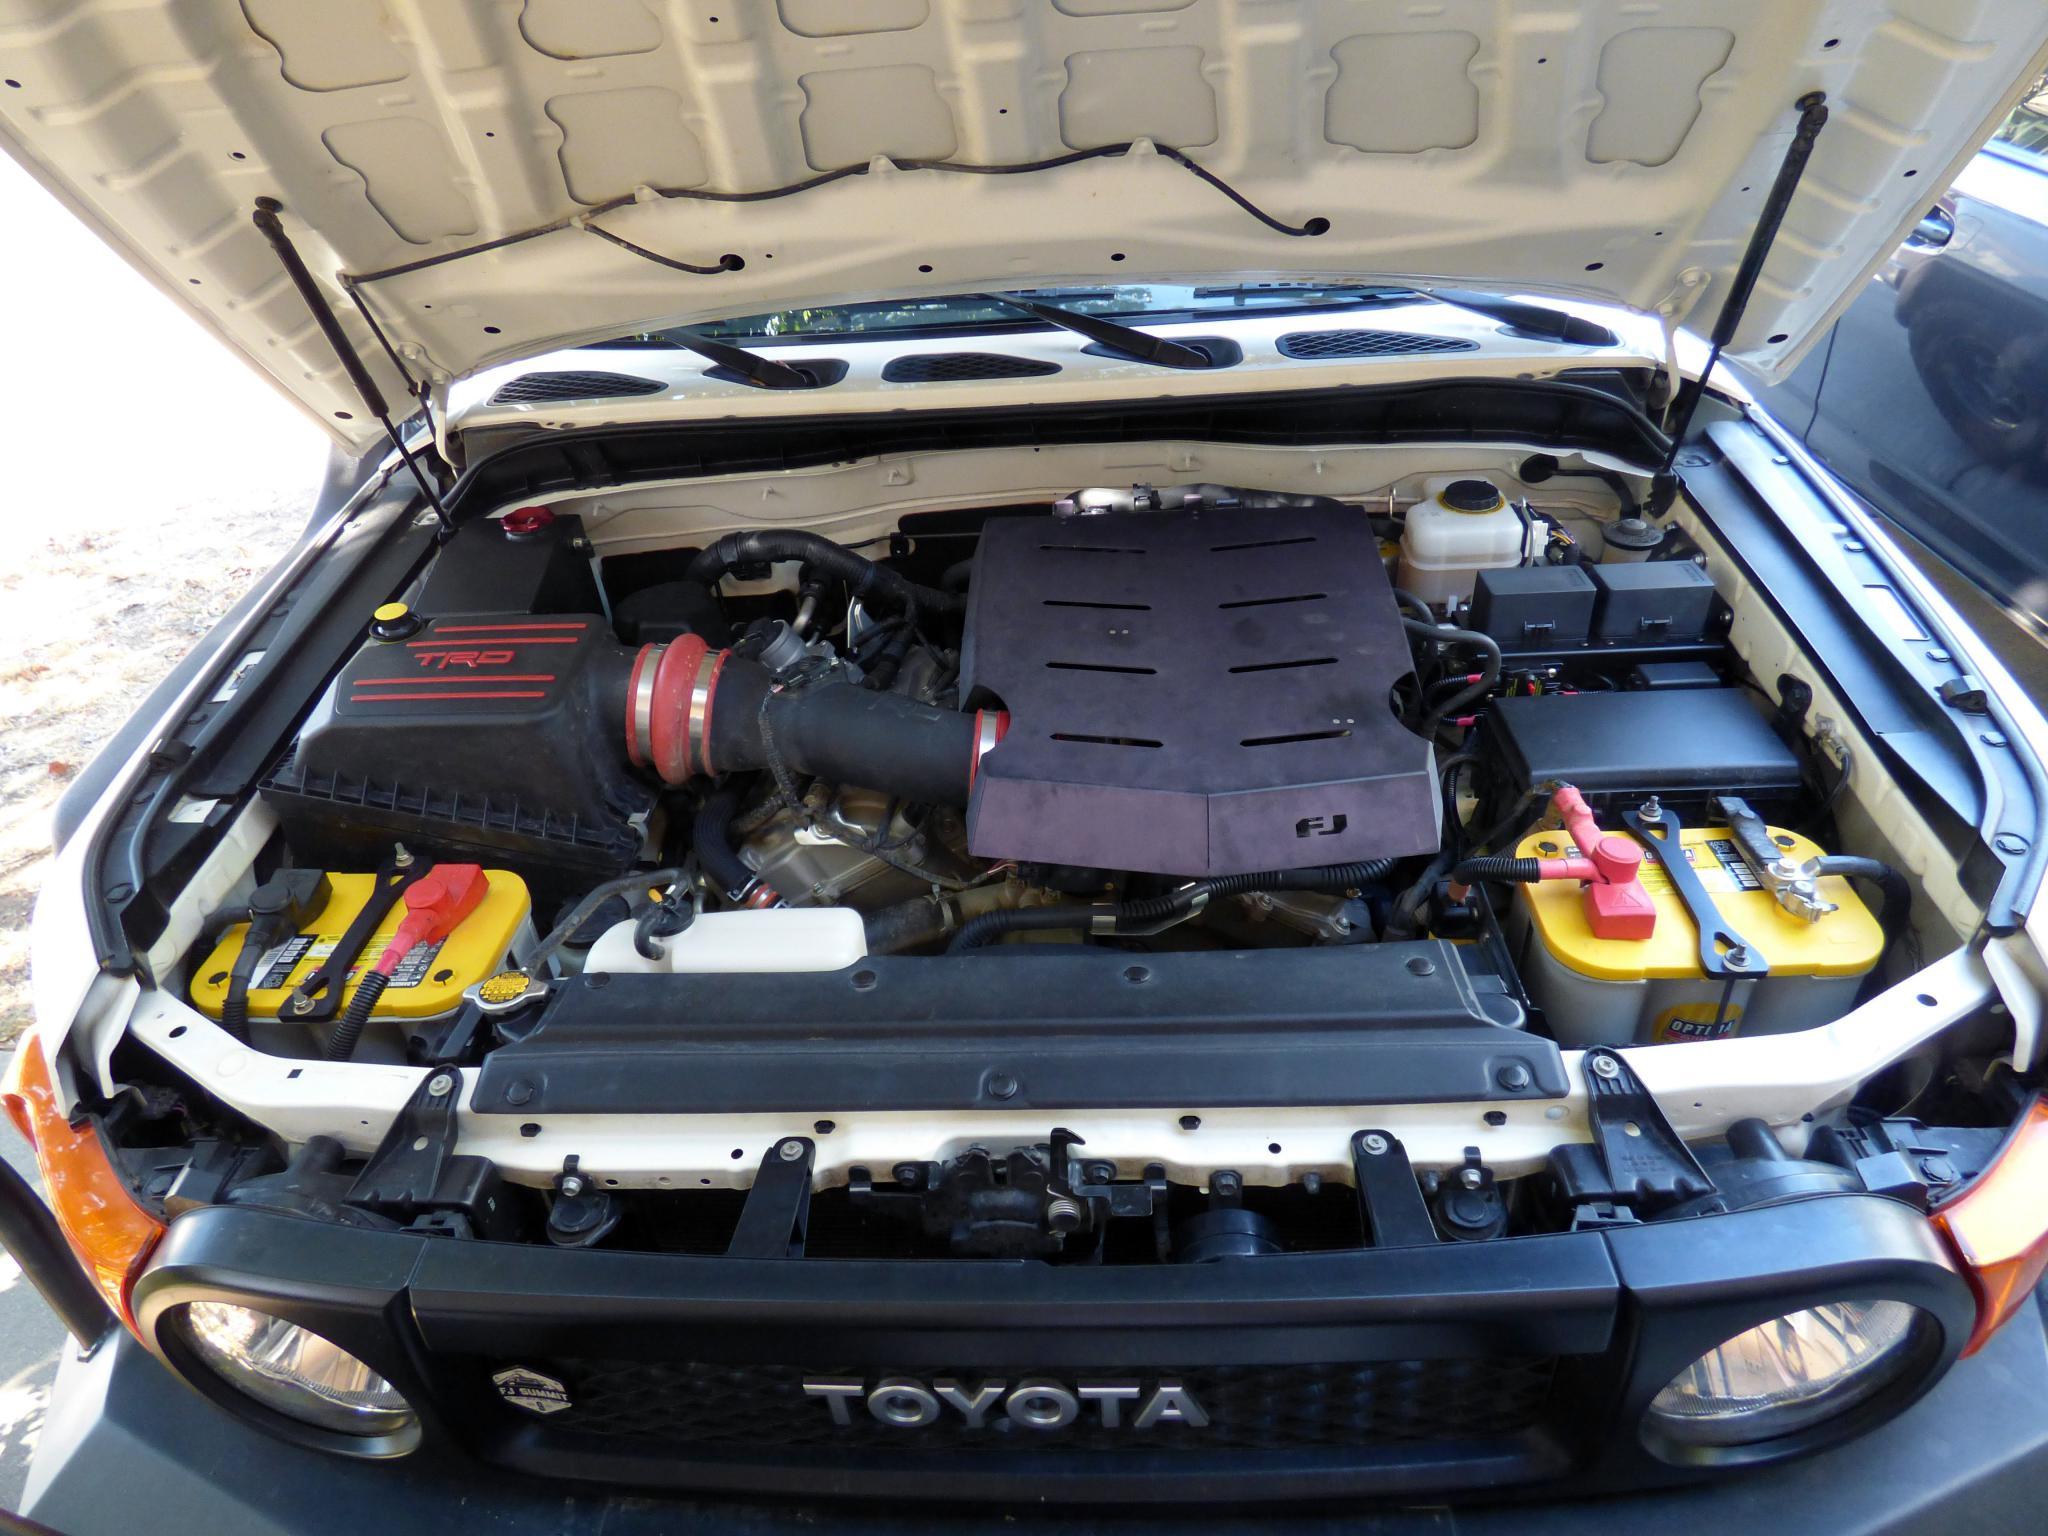 Fuse Box Toyotum Fj